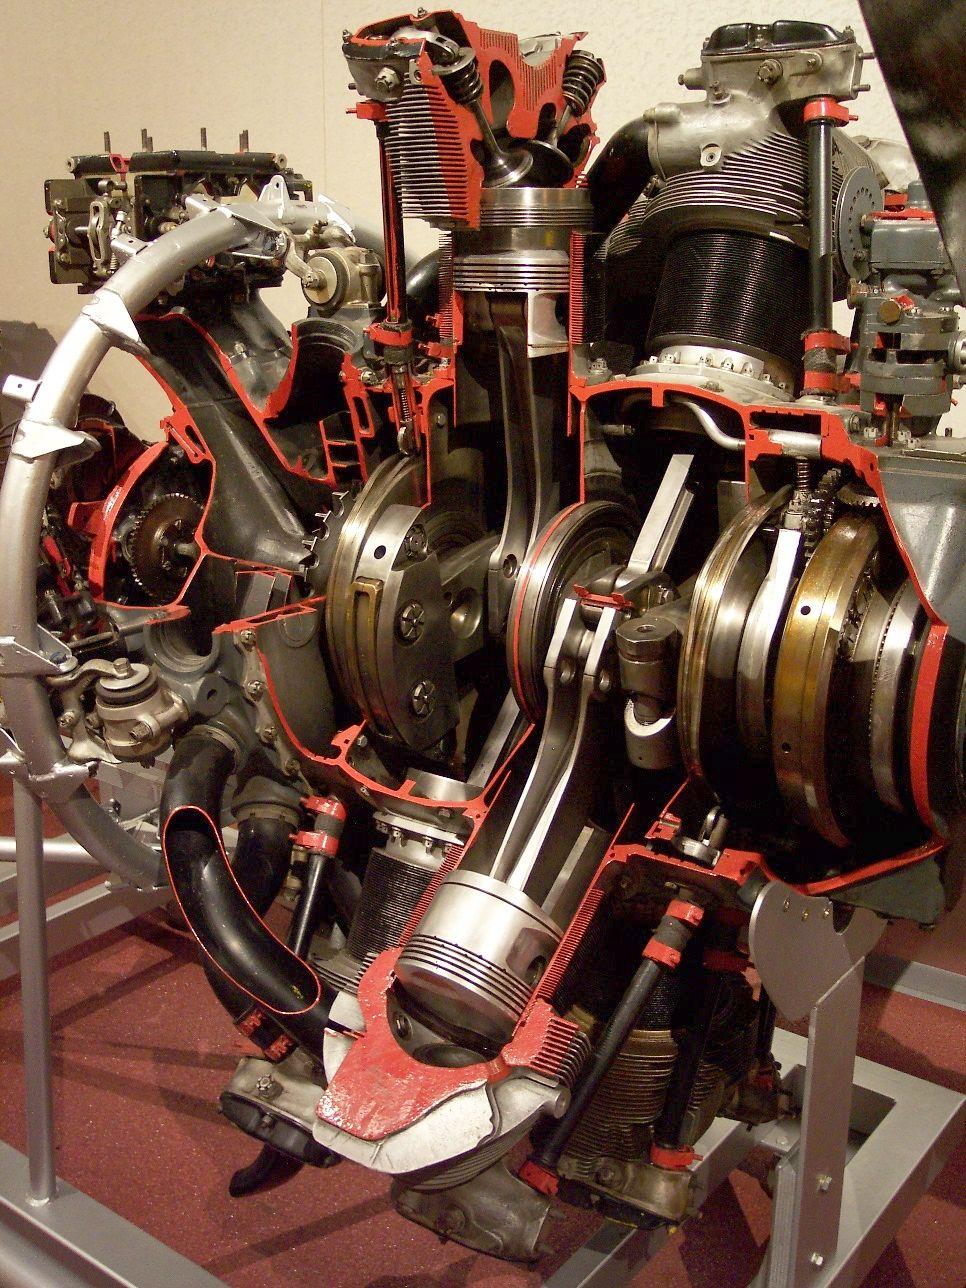 Motore termico  Wikipedia